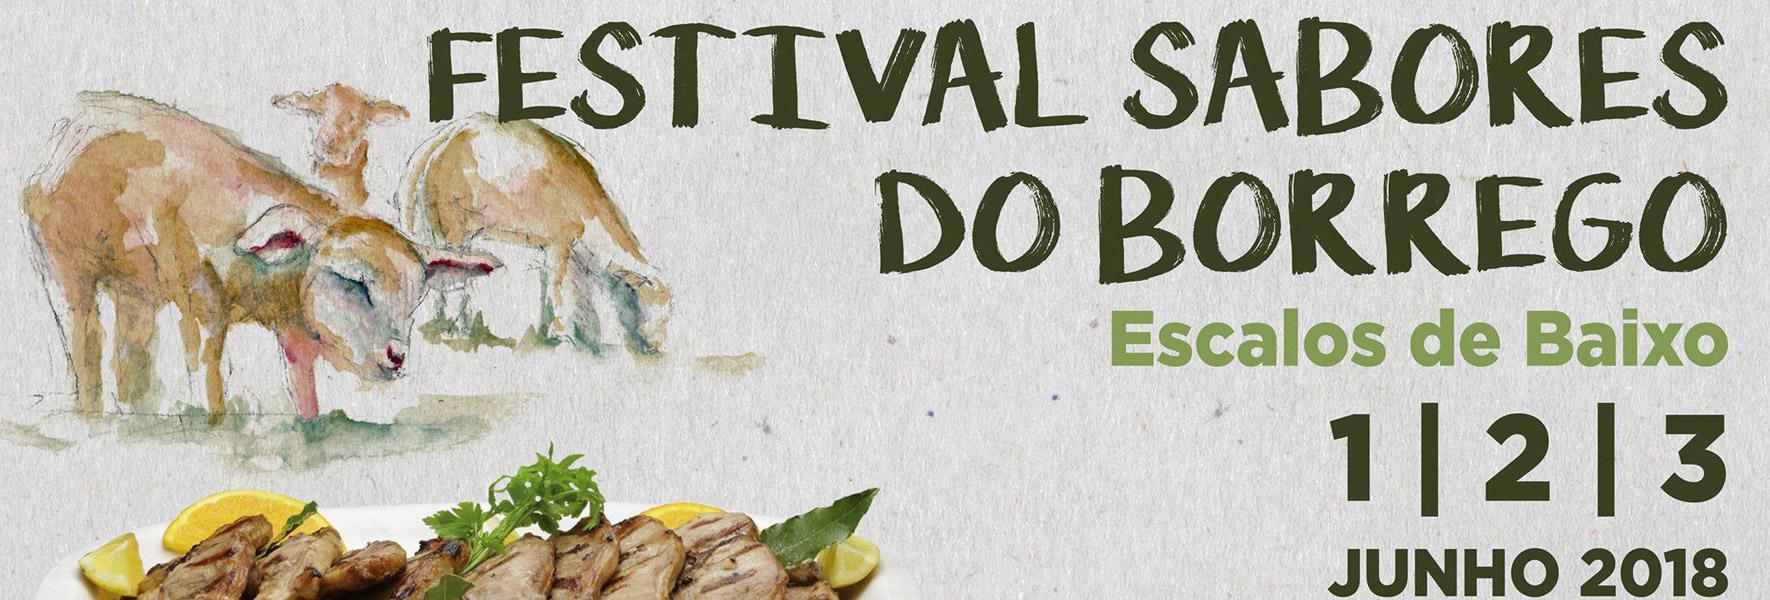 Festival Sabores Do Borrego 2018 – 1, 2 E 3 De Junho 2018